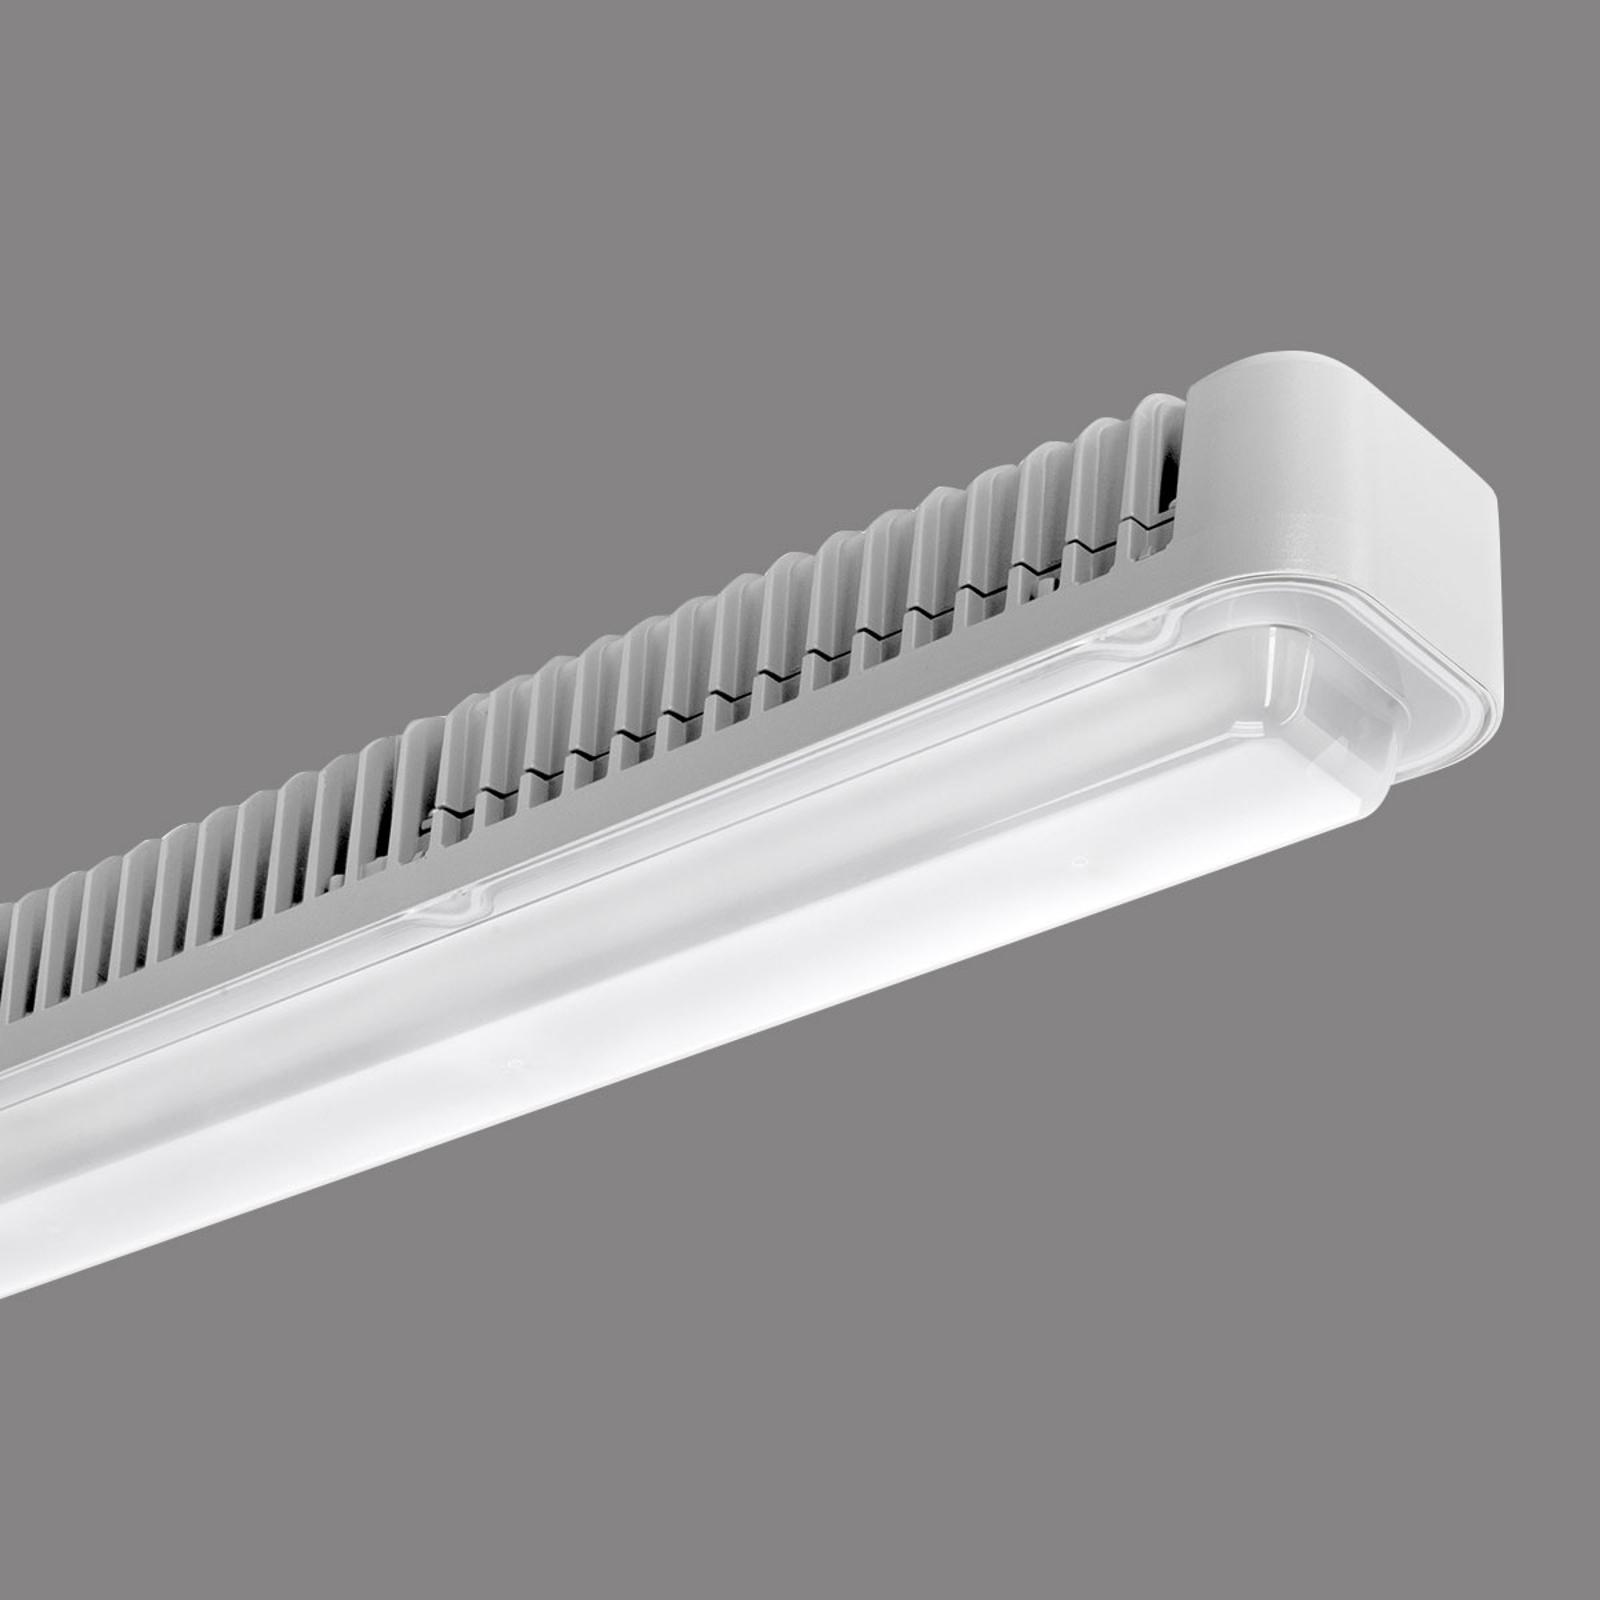 LED-kattovalaisin Koa Line STR/PC S/EW 112W